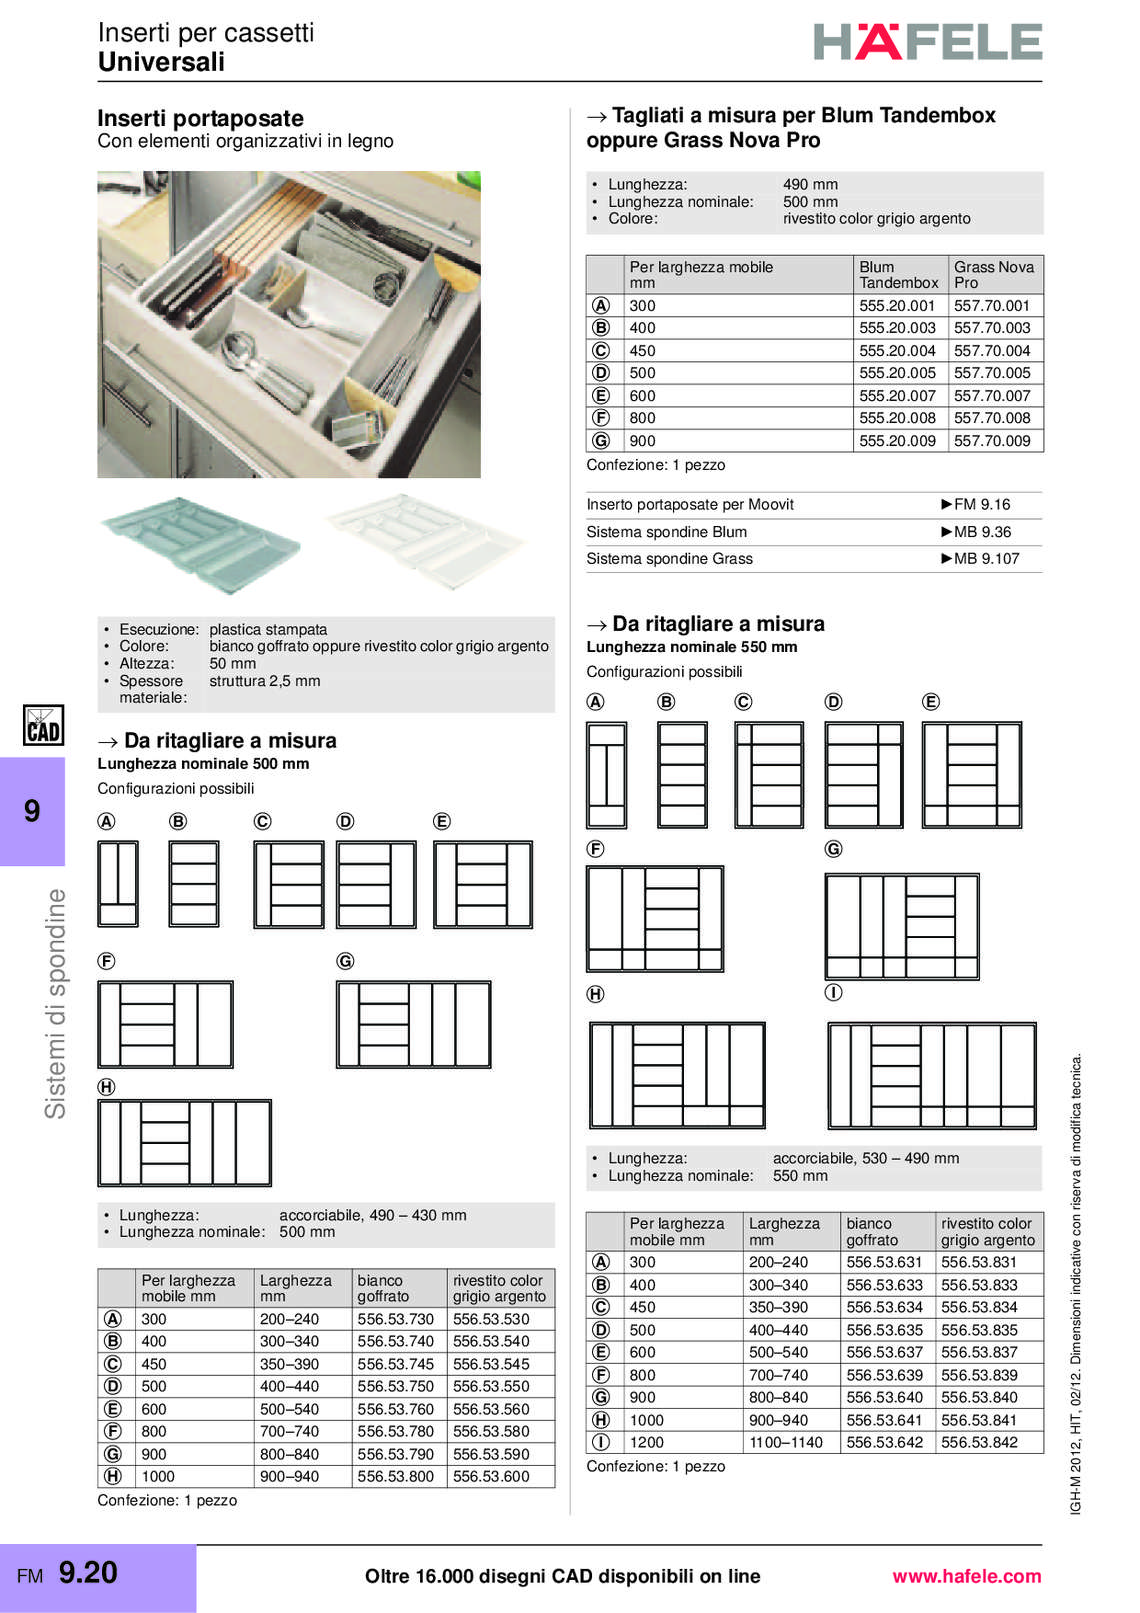 hafele-spondine-e-guide-per-mobili_40_033.jpg